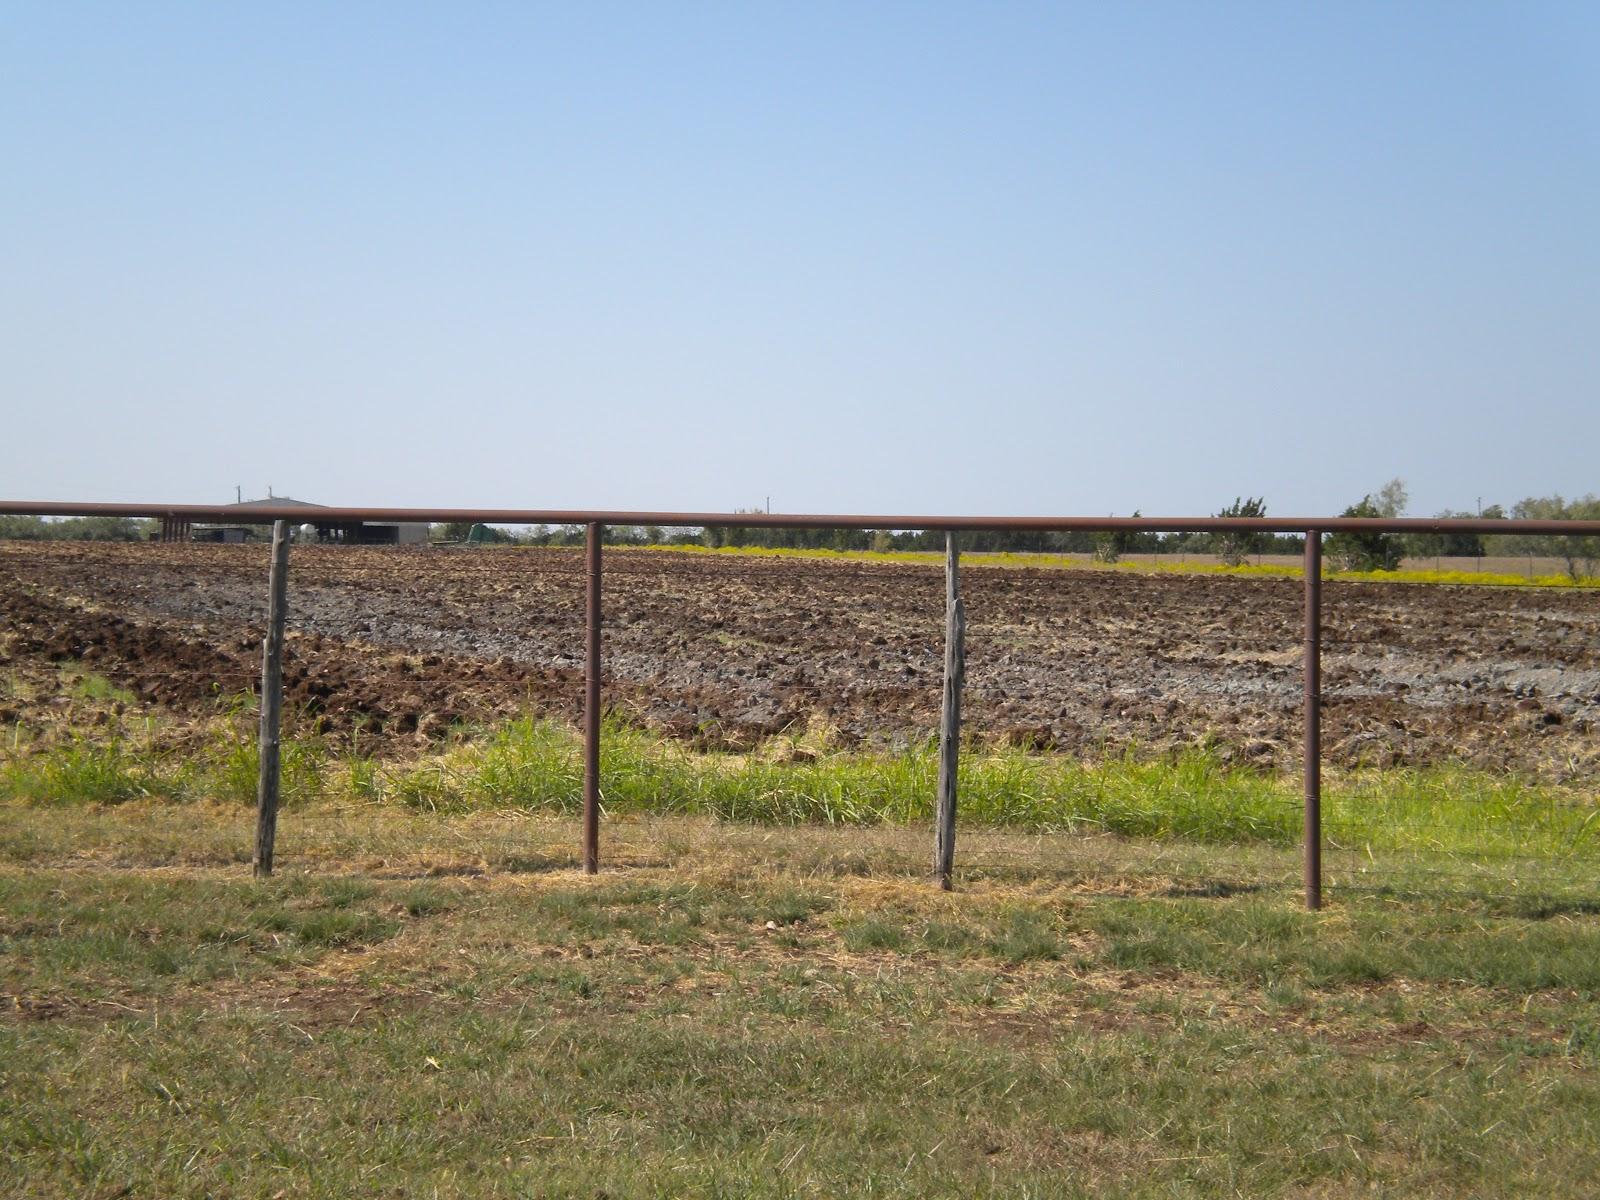 johnson county mudd farm near rio vista